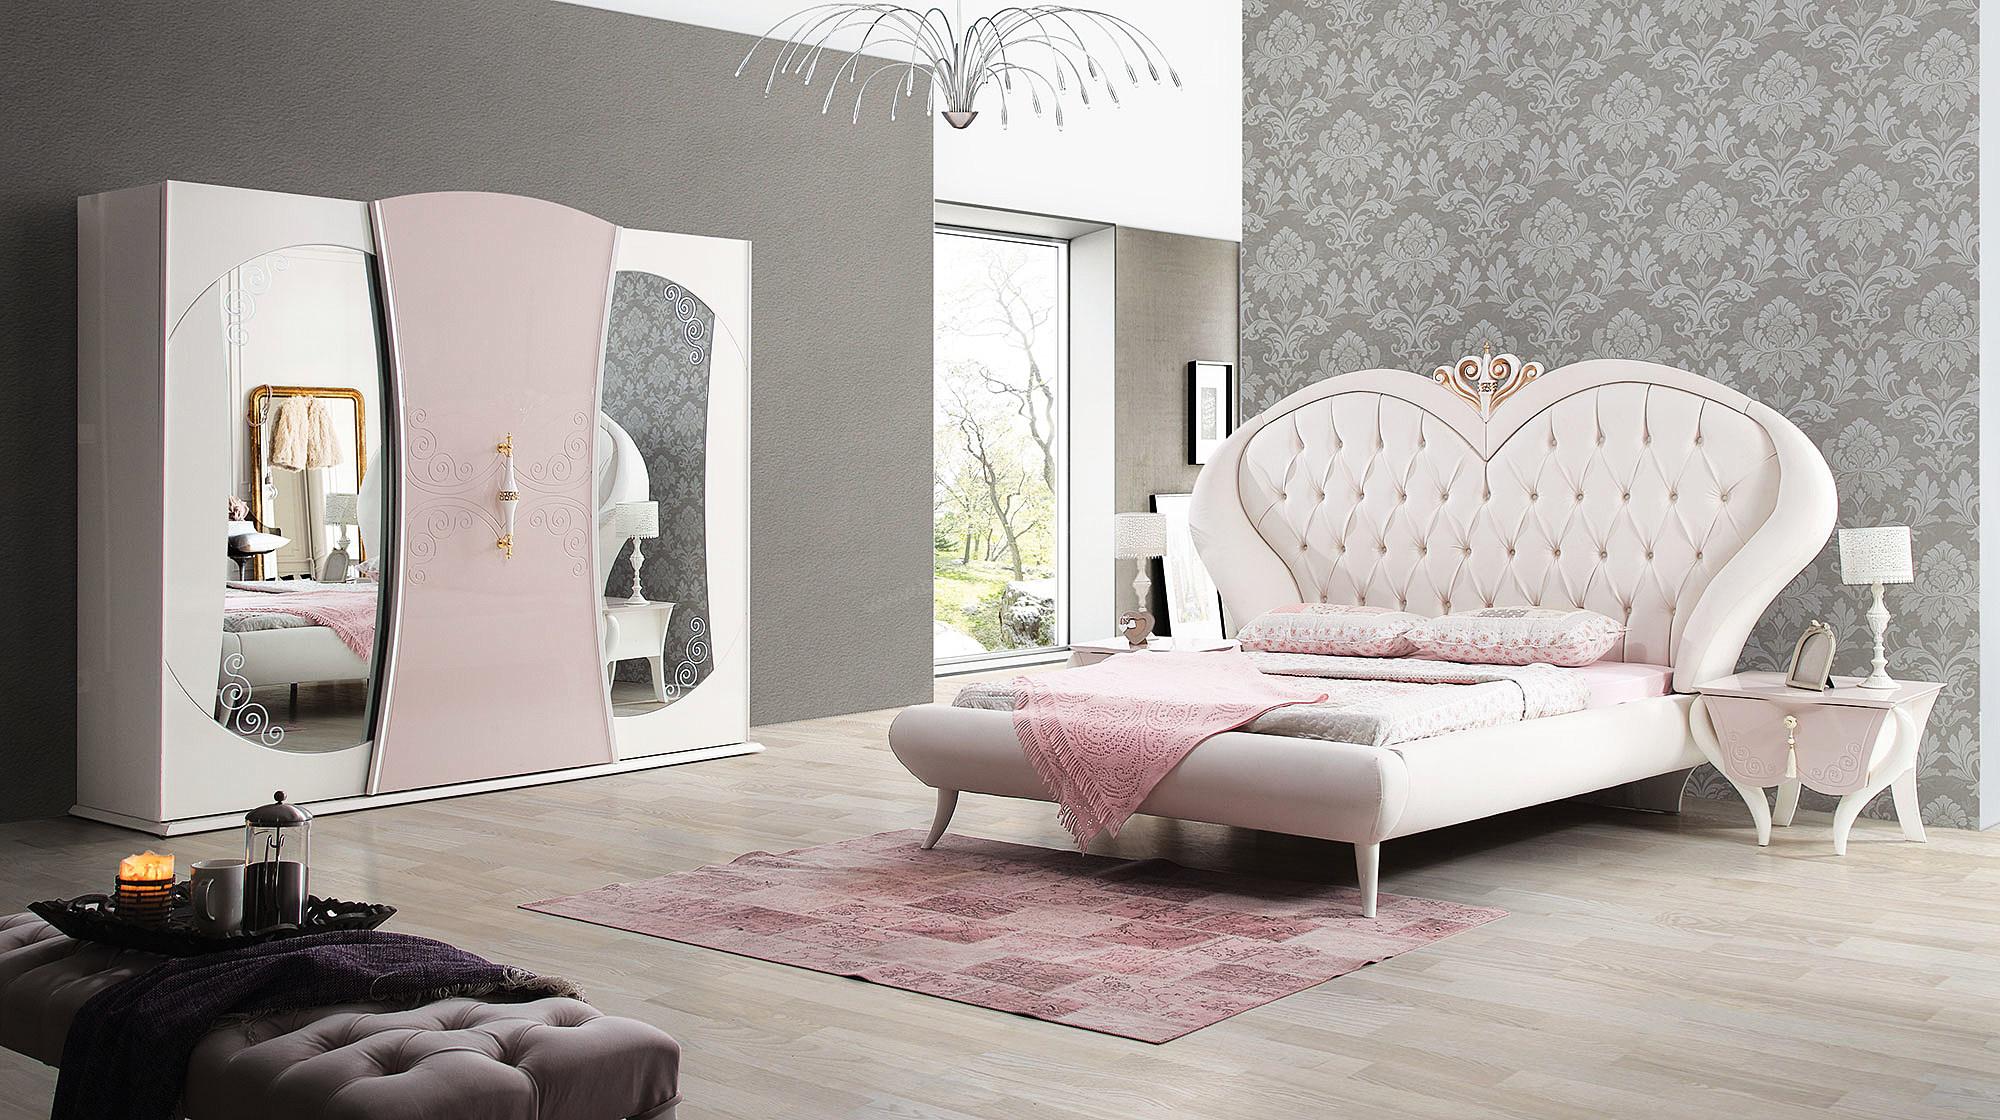 بالصور صور غرف النوم , جنتك فى غرفه نومك 2938 6